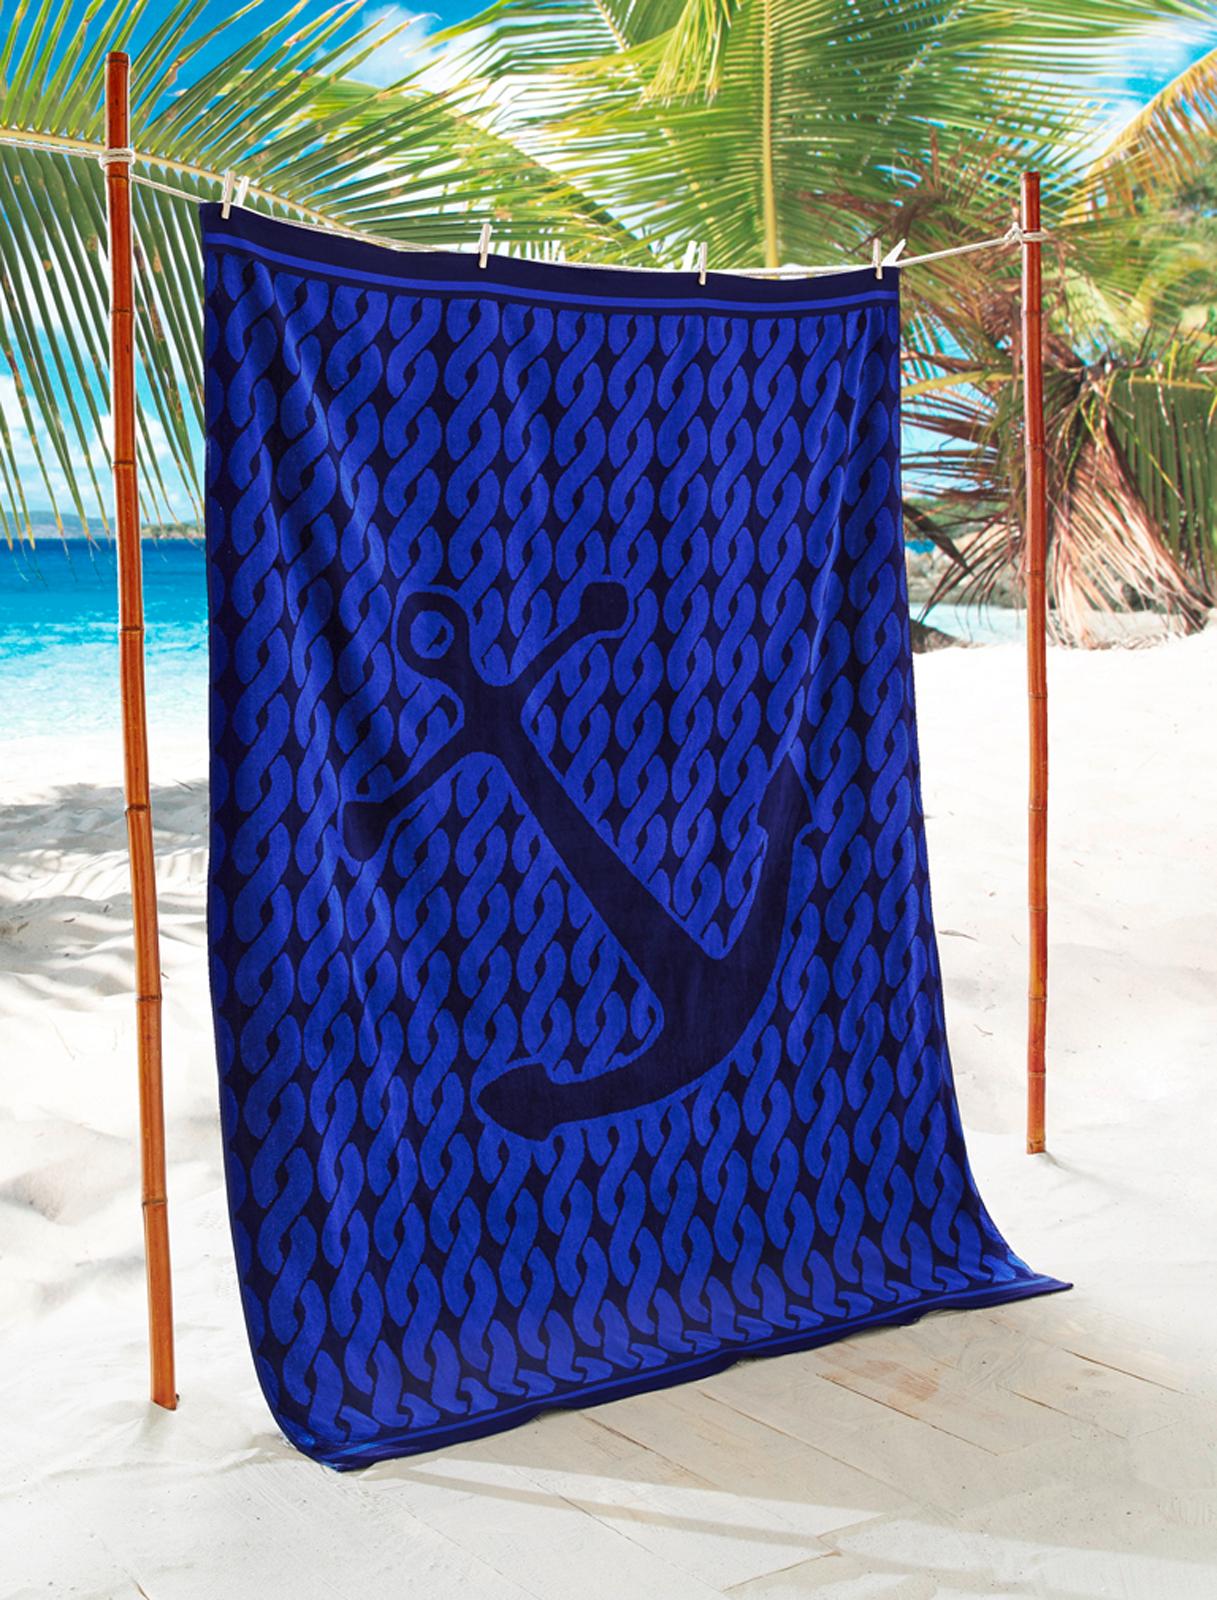 xxl partner velours strandtuch strandlaken jacquard 140x200 cm ebay. Black Bedroom Furniture Sets. Home Design Ideas